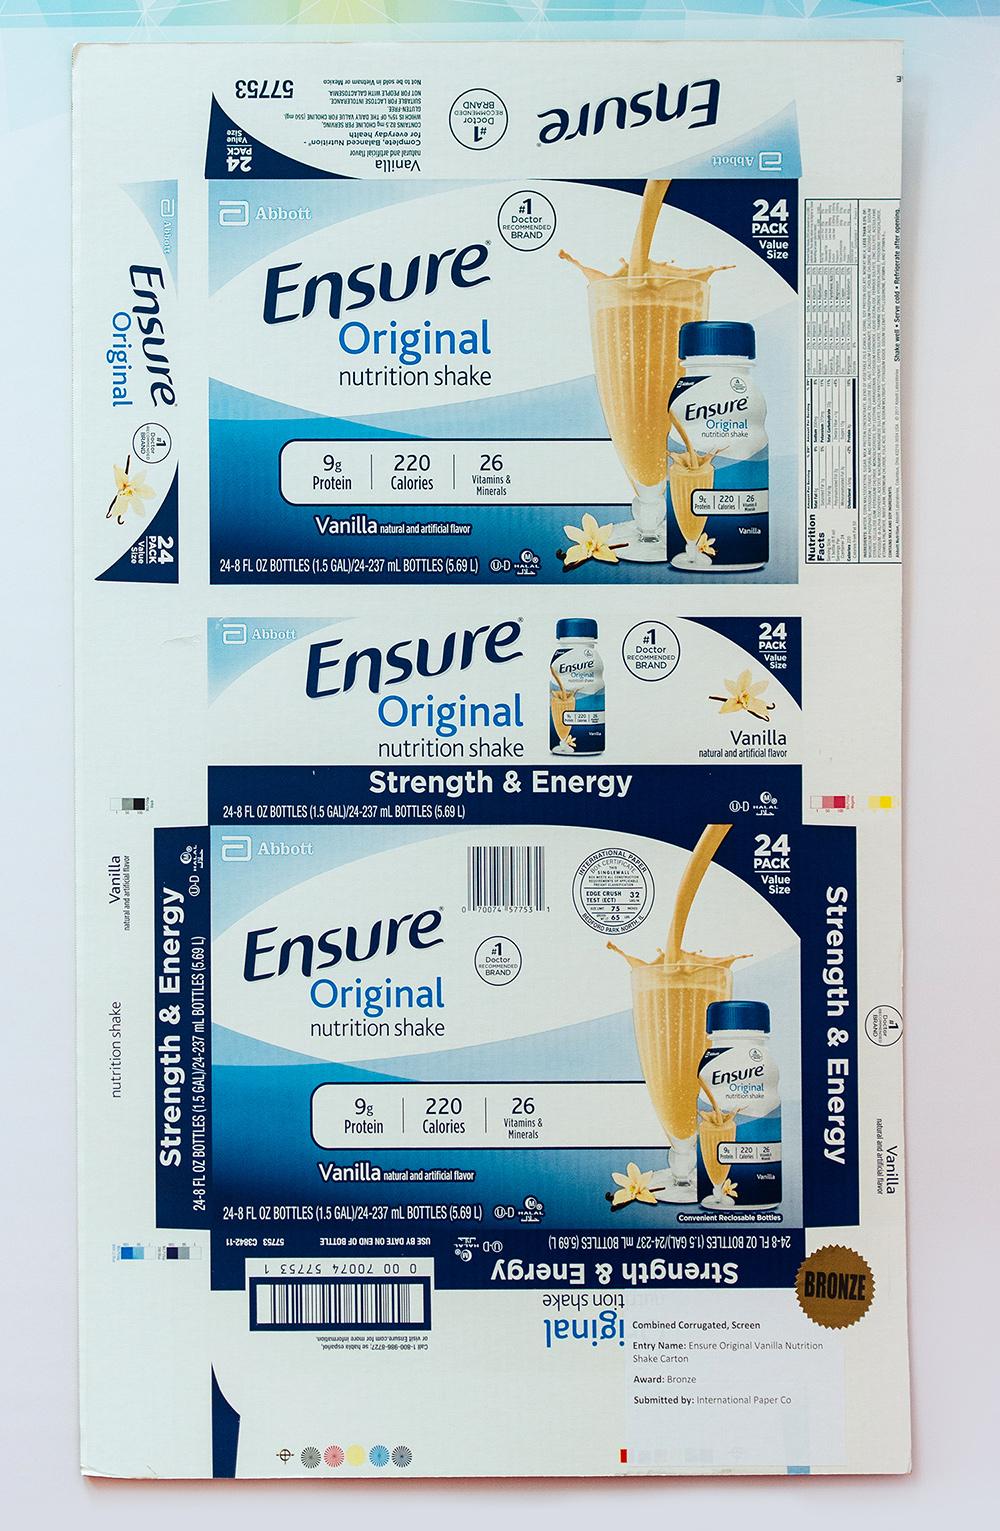 BRONZE AWARD: Ensure Original Vanilla Nutrition Shake carton, International Paper Co.